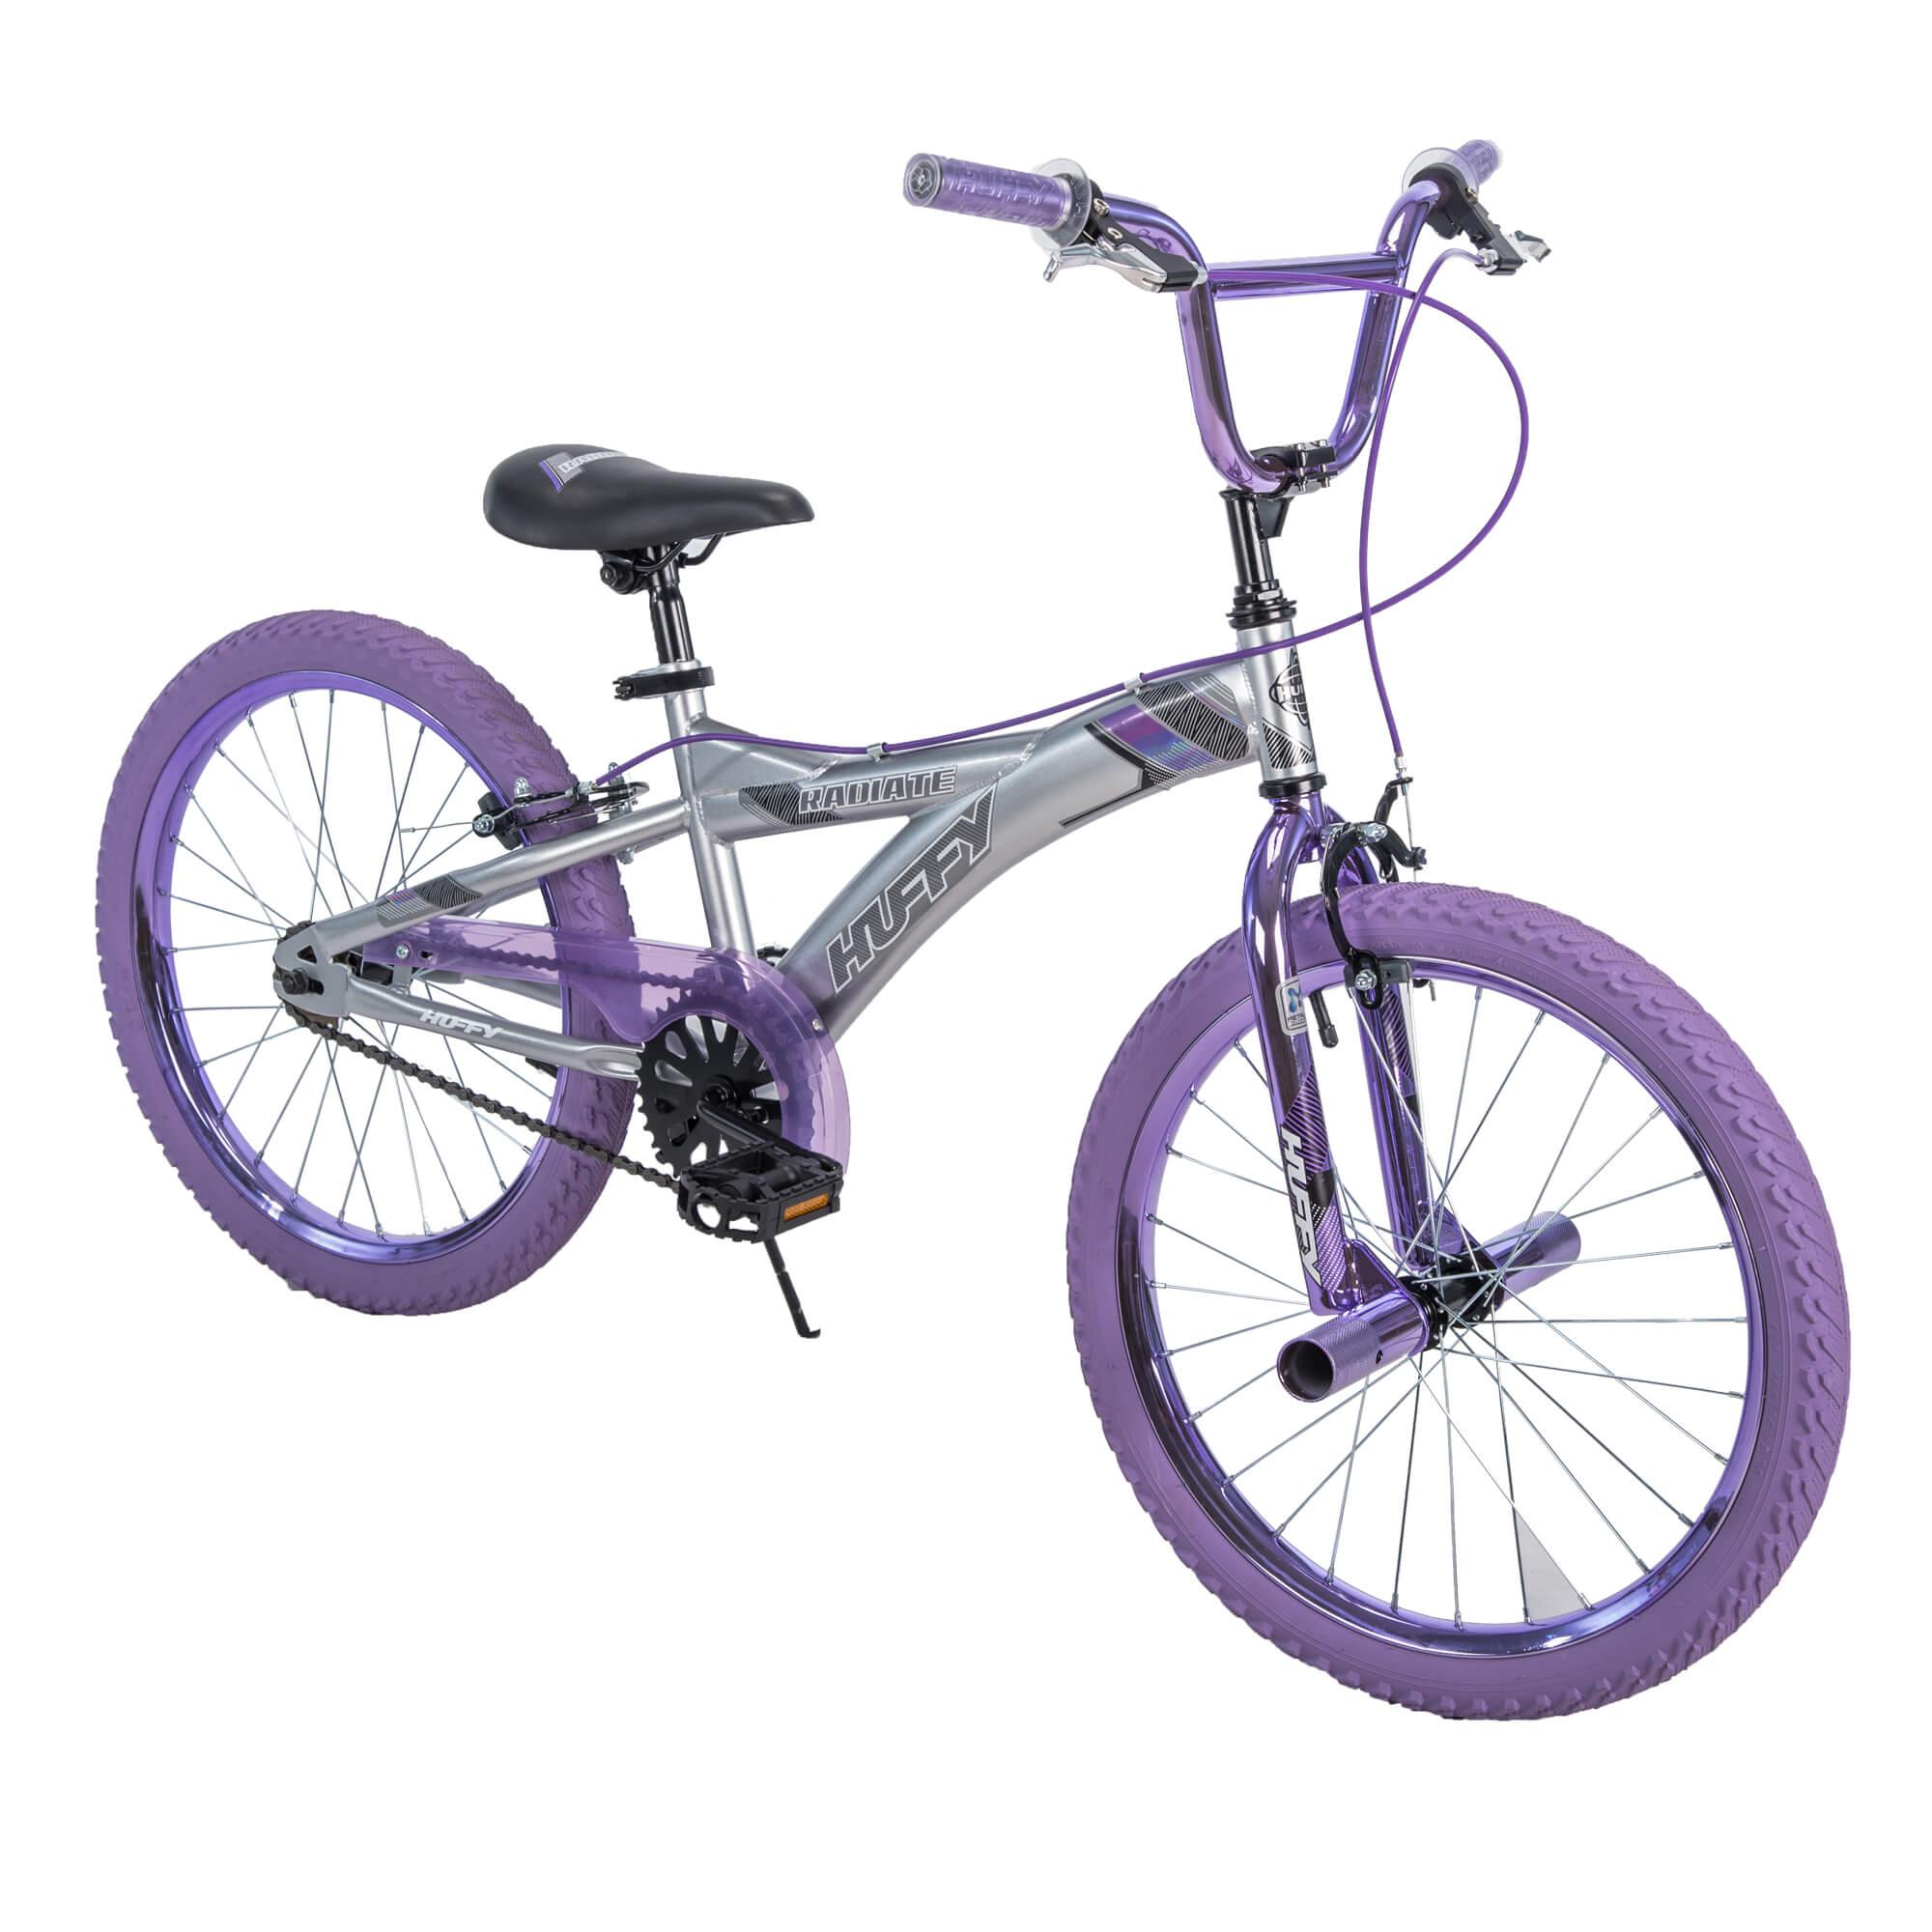 "Huffy 20"" Radium Girls' Metaloid BMX-Style Bike, Purple"